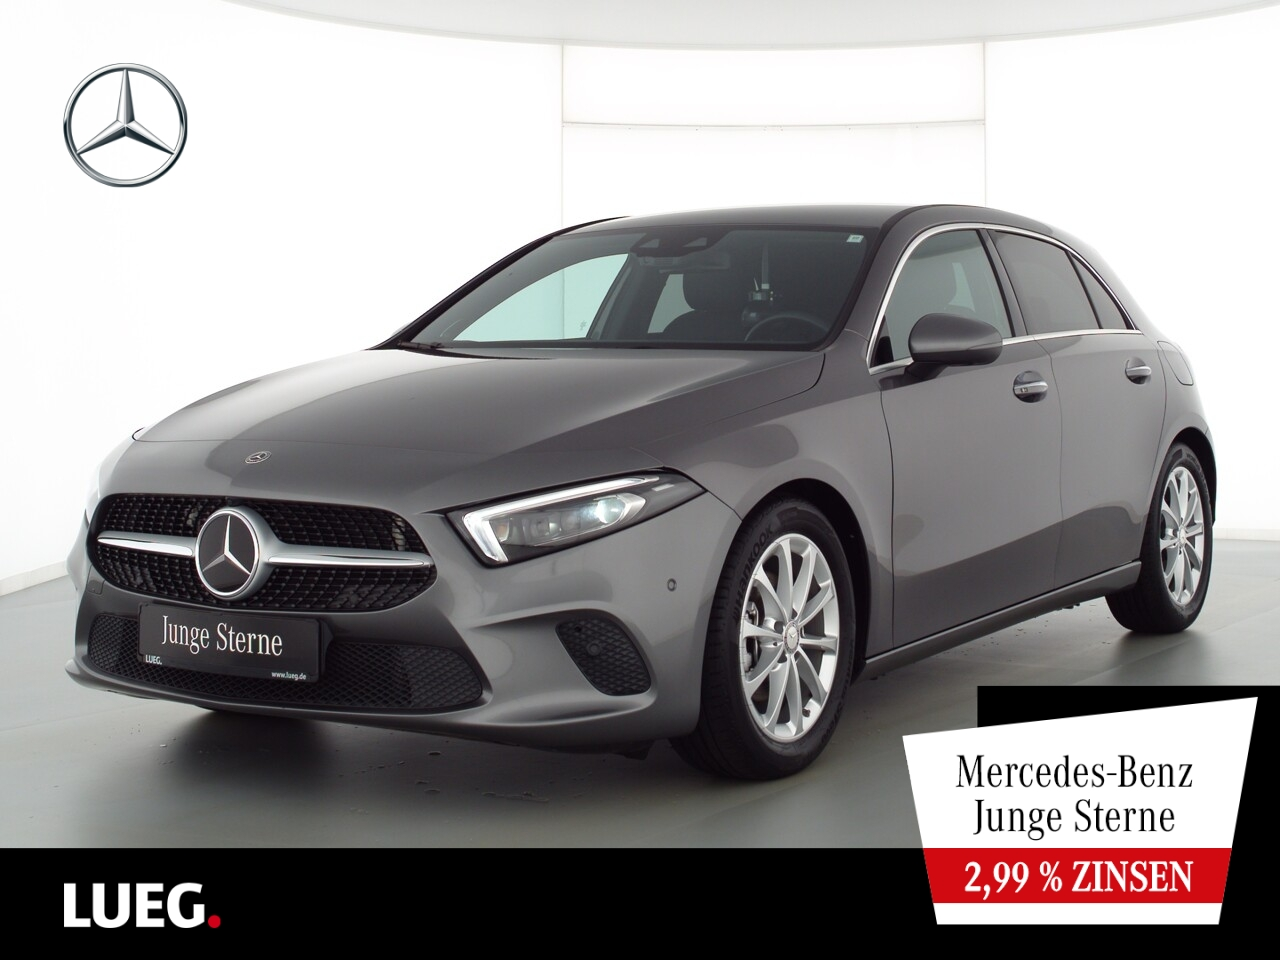 Mercedes-Benz A 180 d Progressive+MBUX+Navi+Burm+Mbeam+AHK+360, Jahr 2019, Diesel